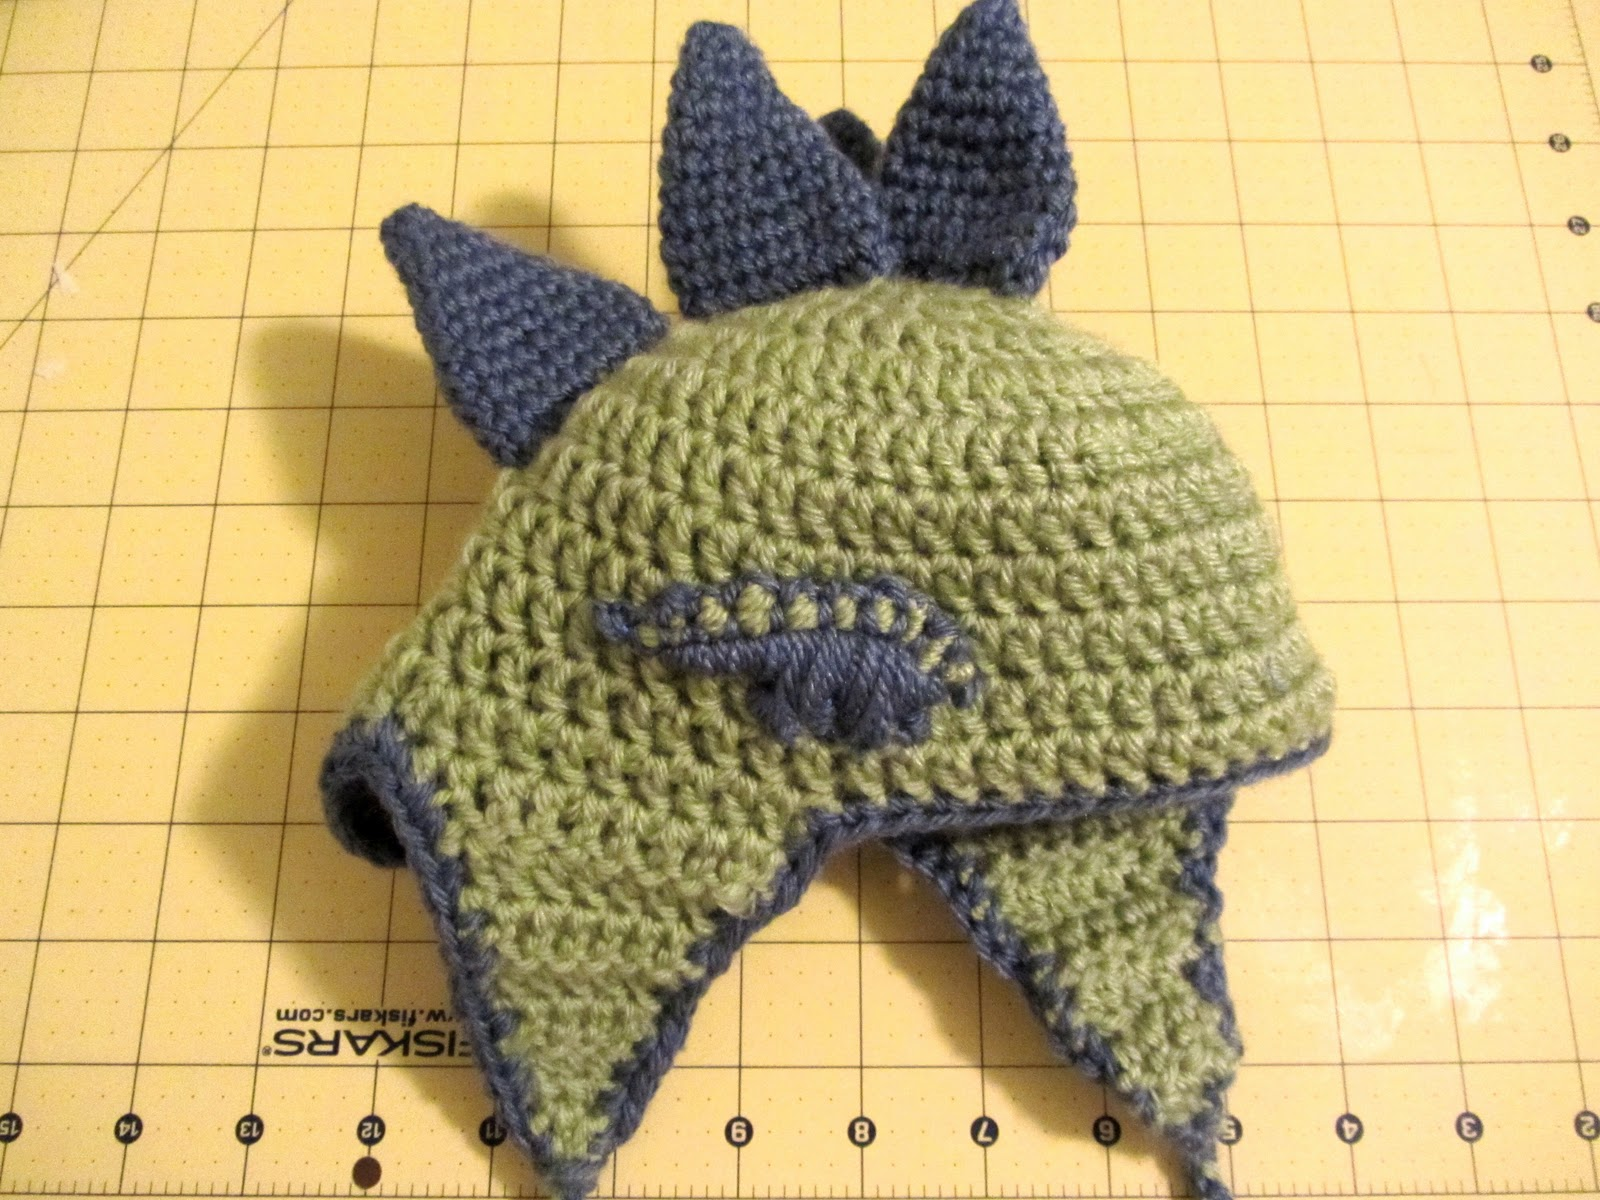 Bright and Shiny - Lovely and Good: Crochet Dinosaur Hat